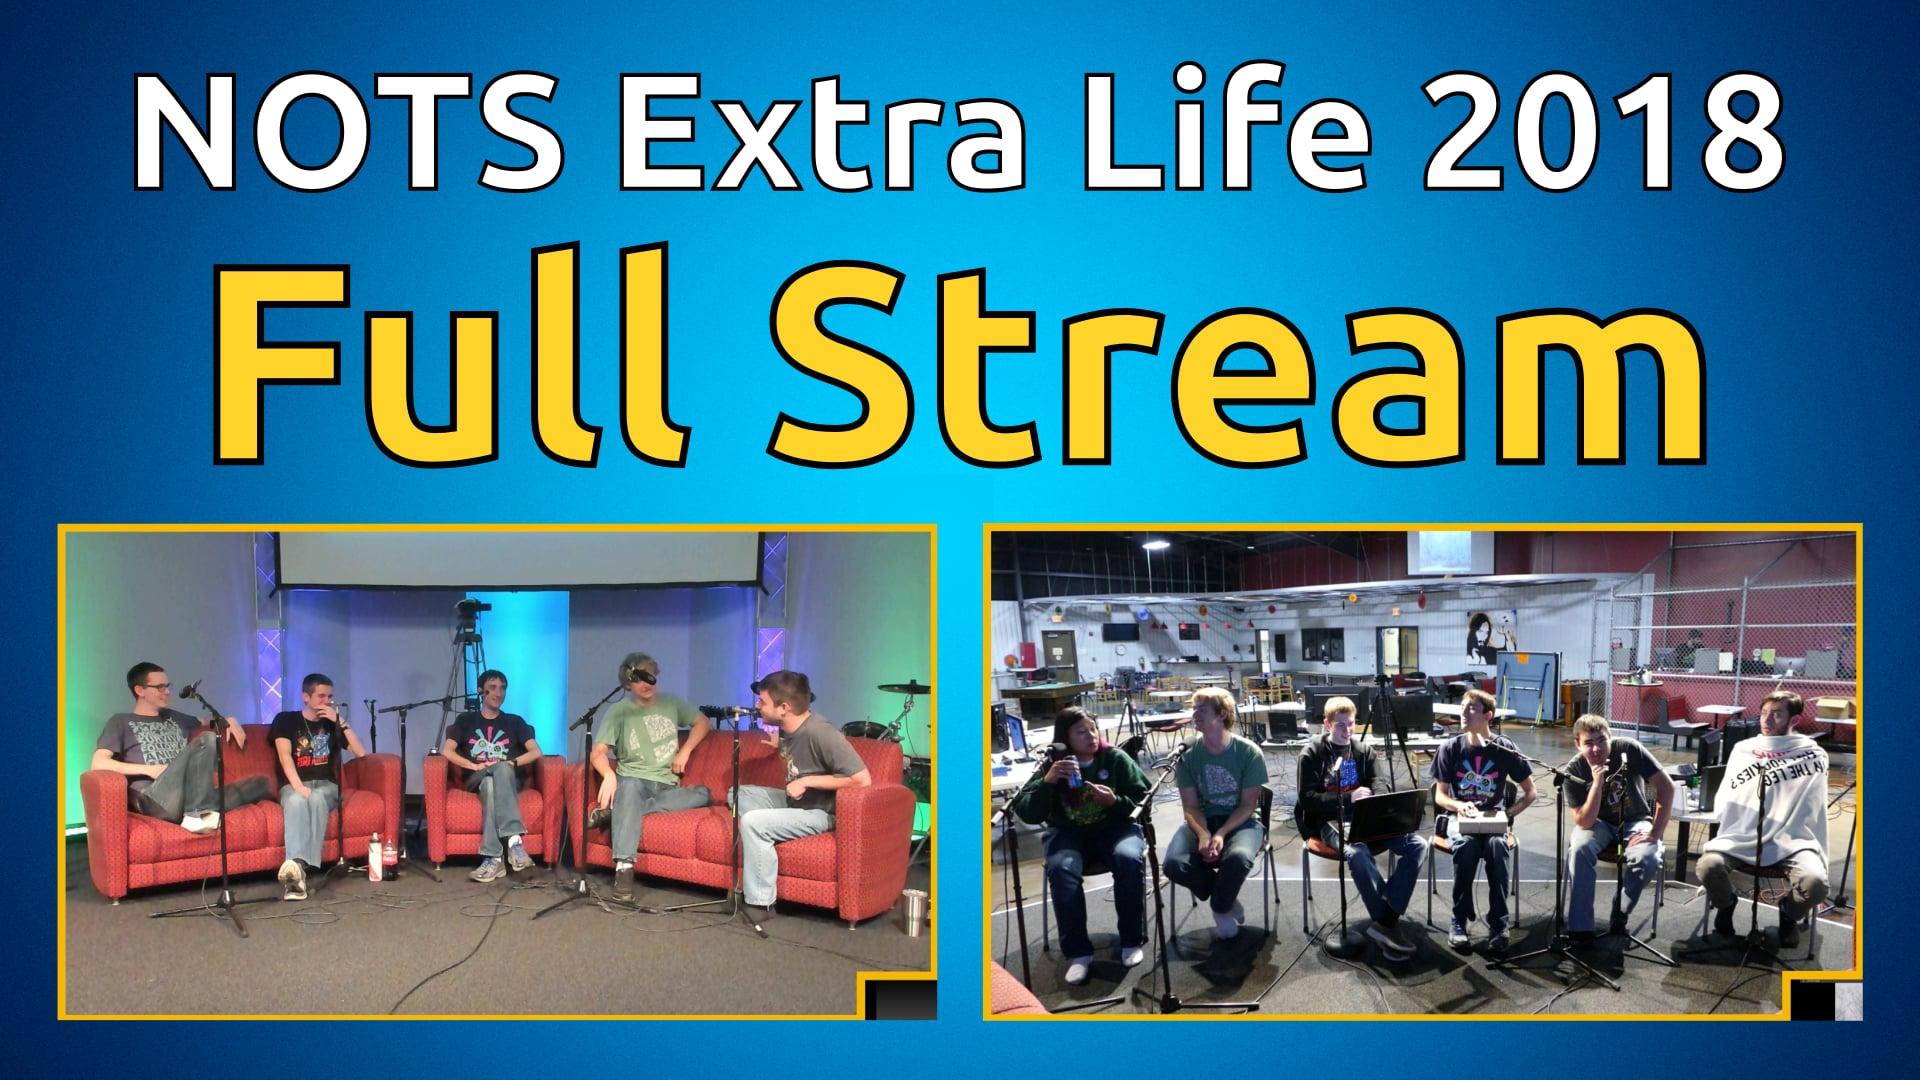 NOTS Extra Life 2018 - Full Stream (Part 2 of 3)